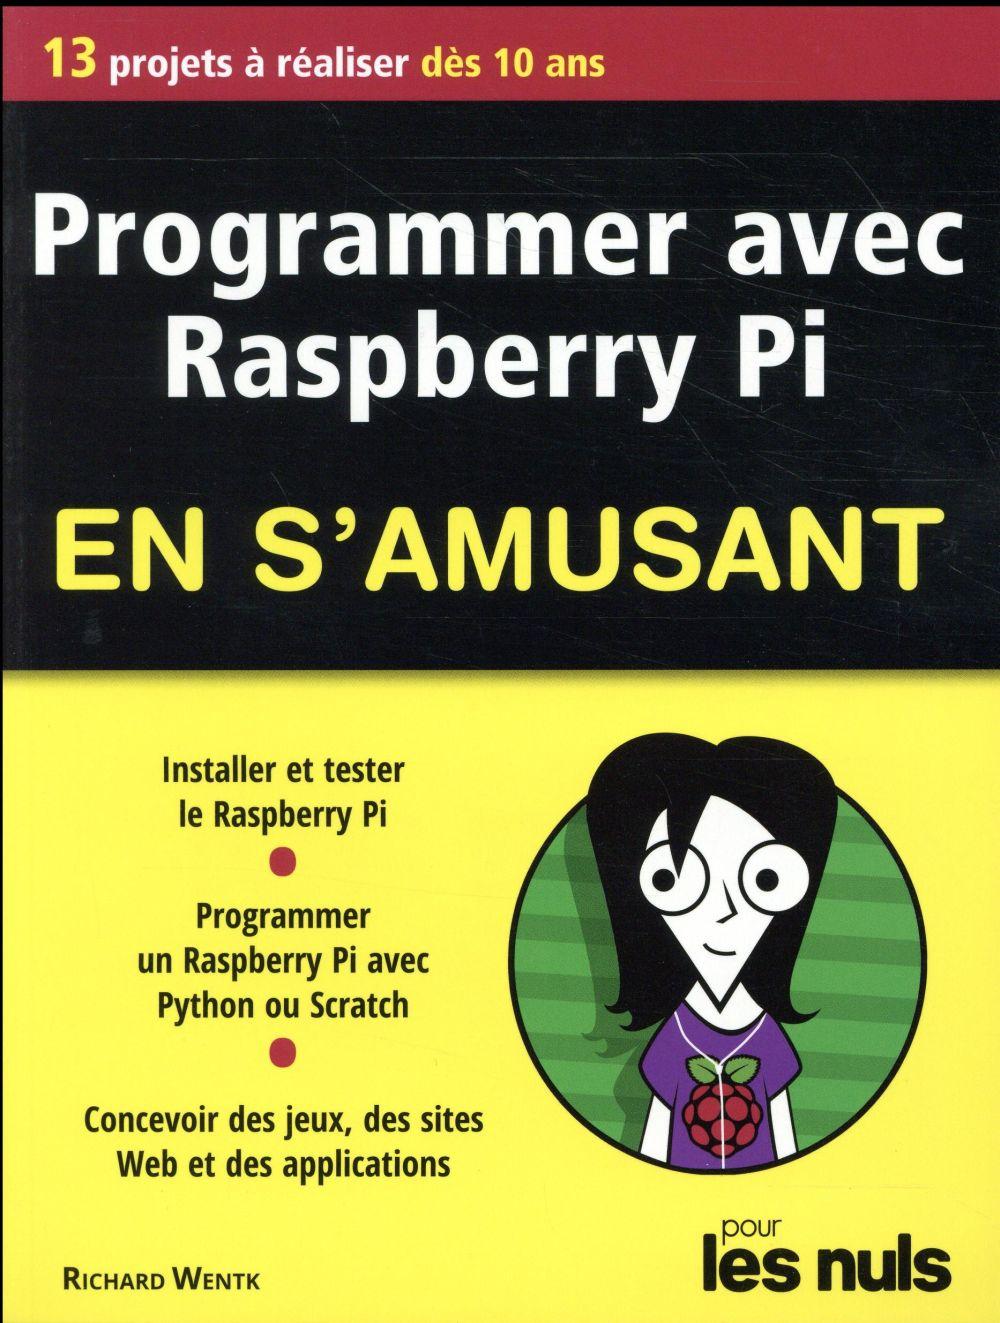 programmer en s'amusant avec Raspberry Pi